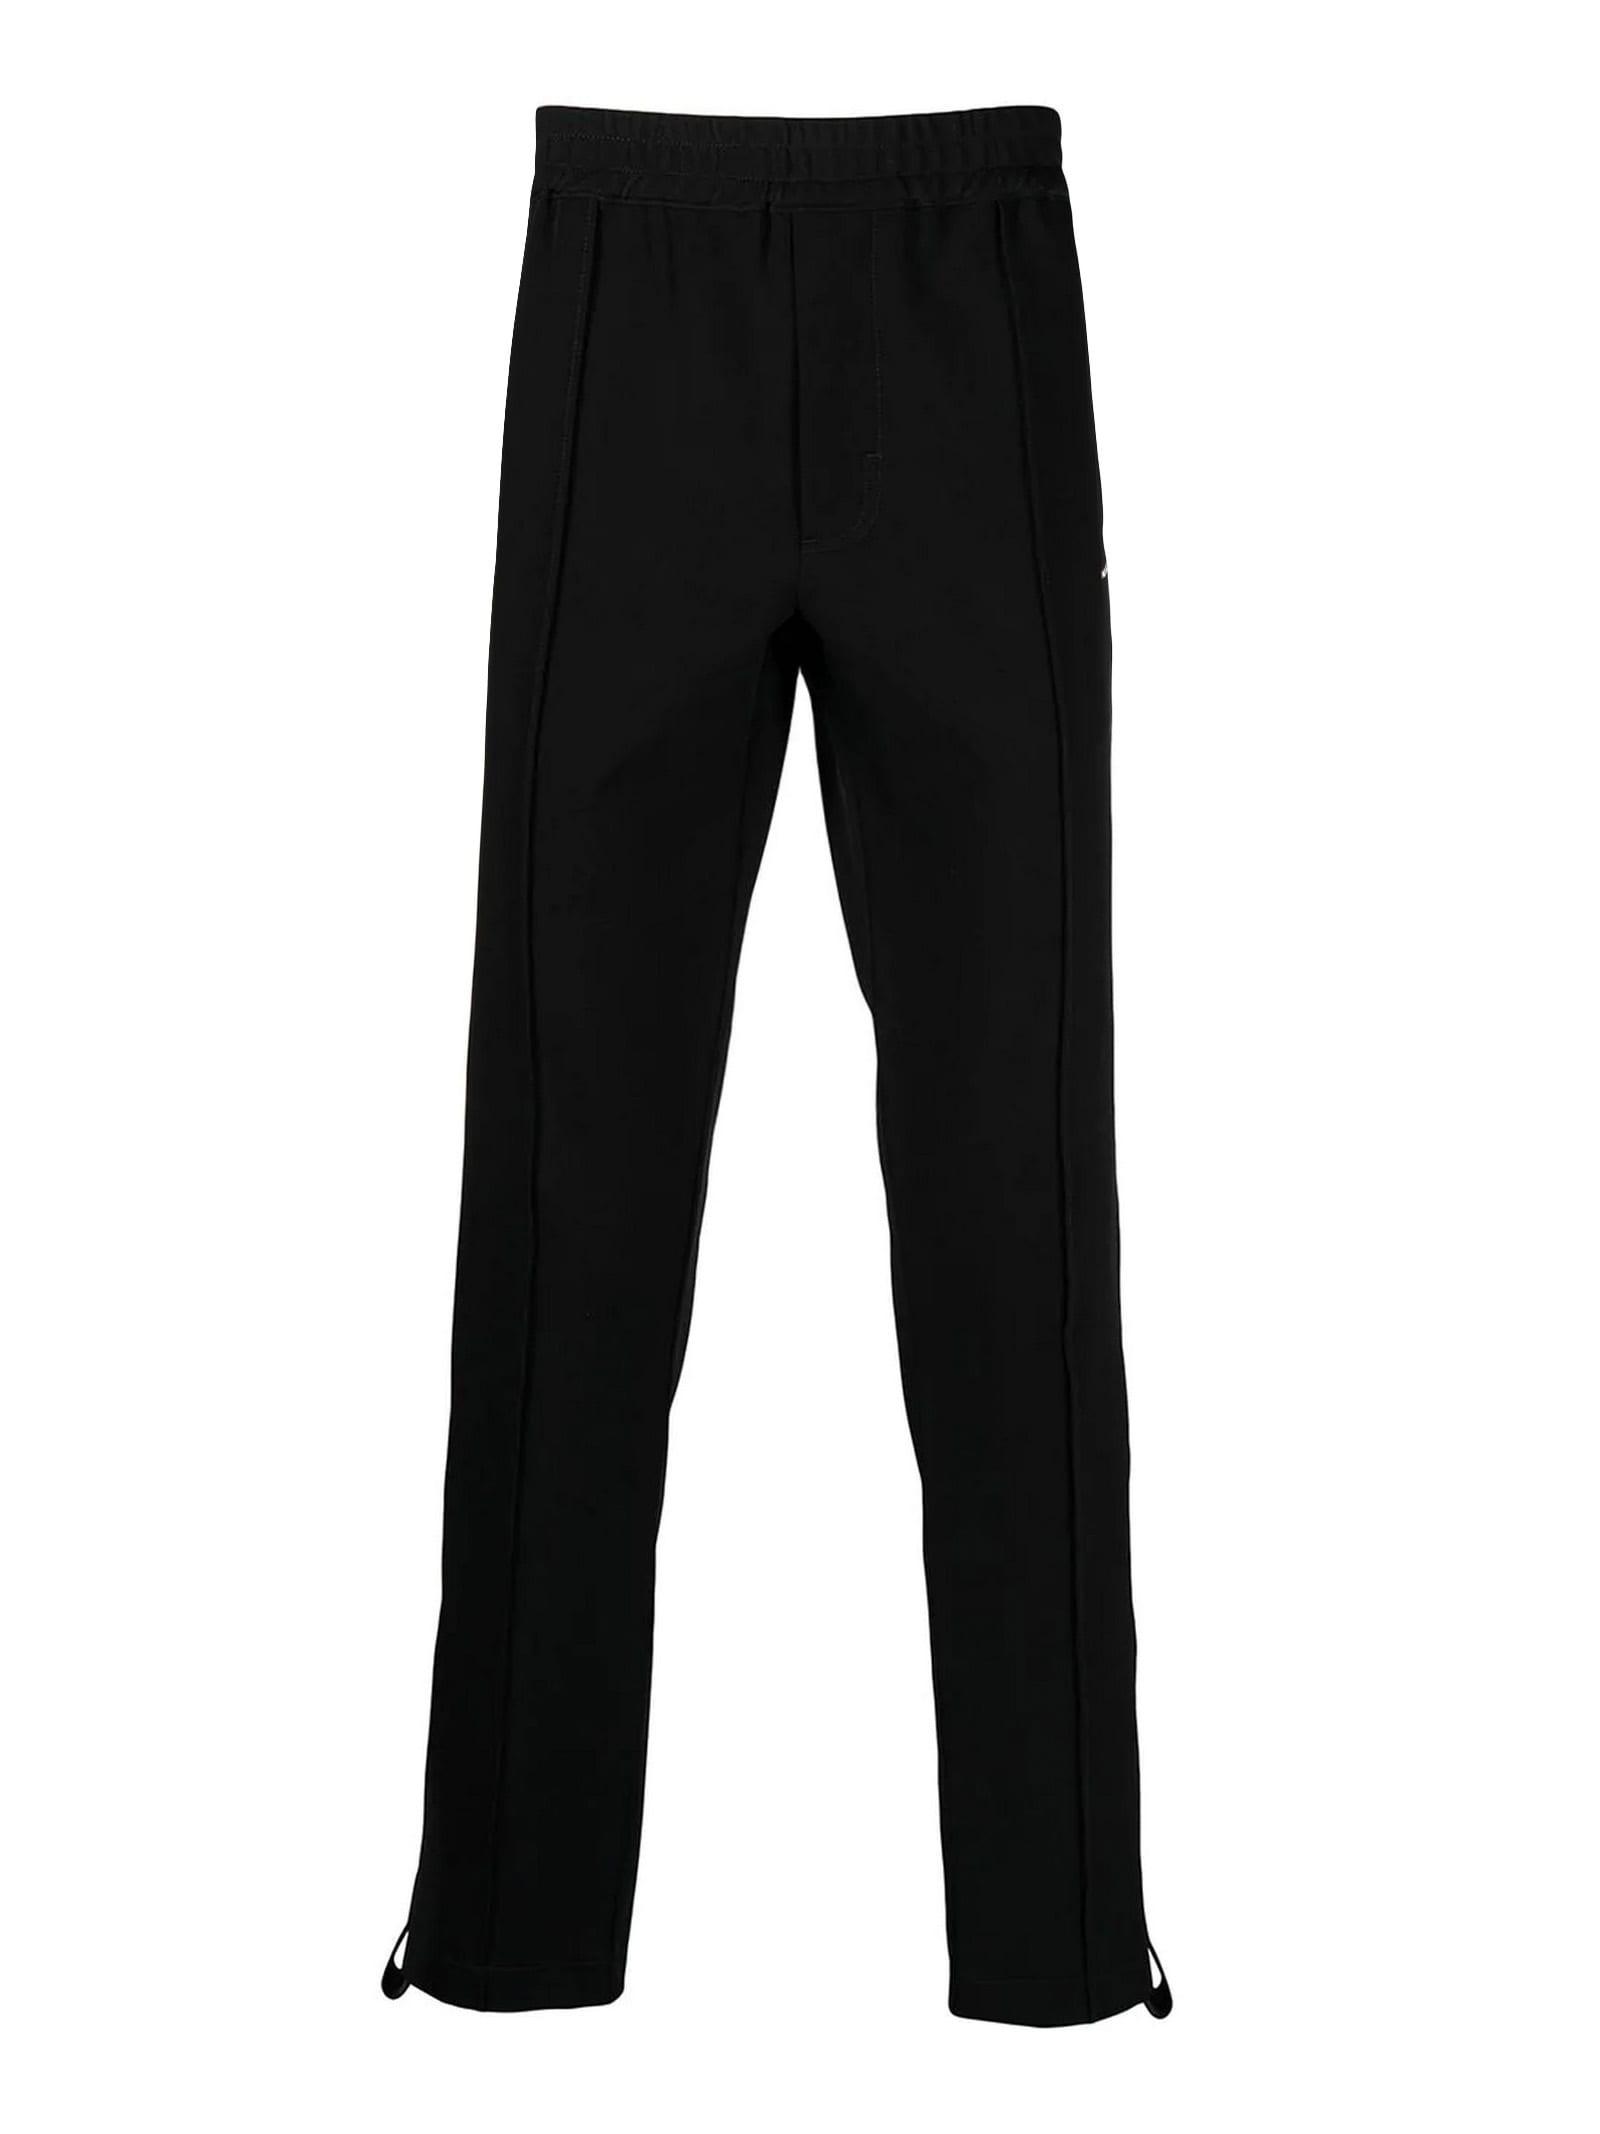 Alyx BLACK TRACK PANTS